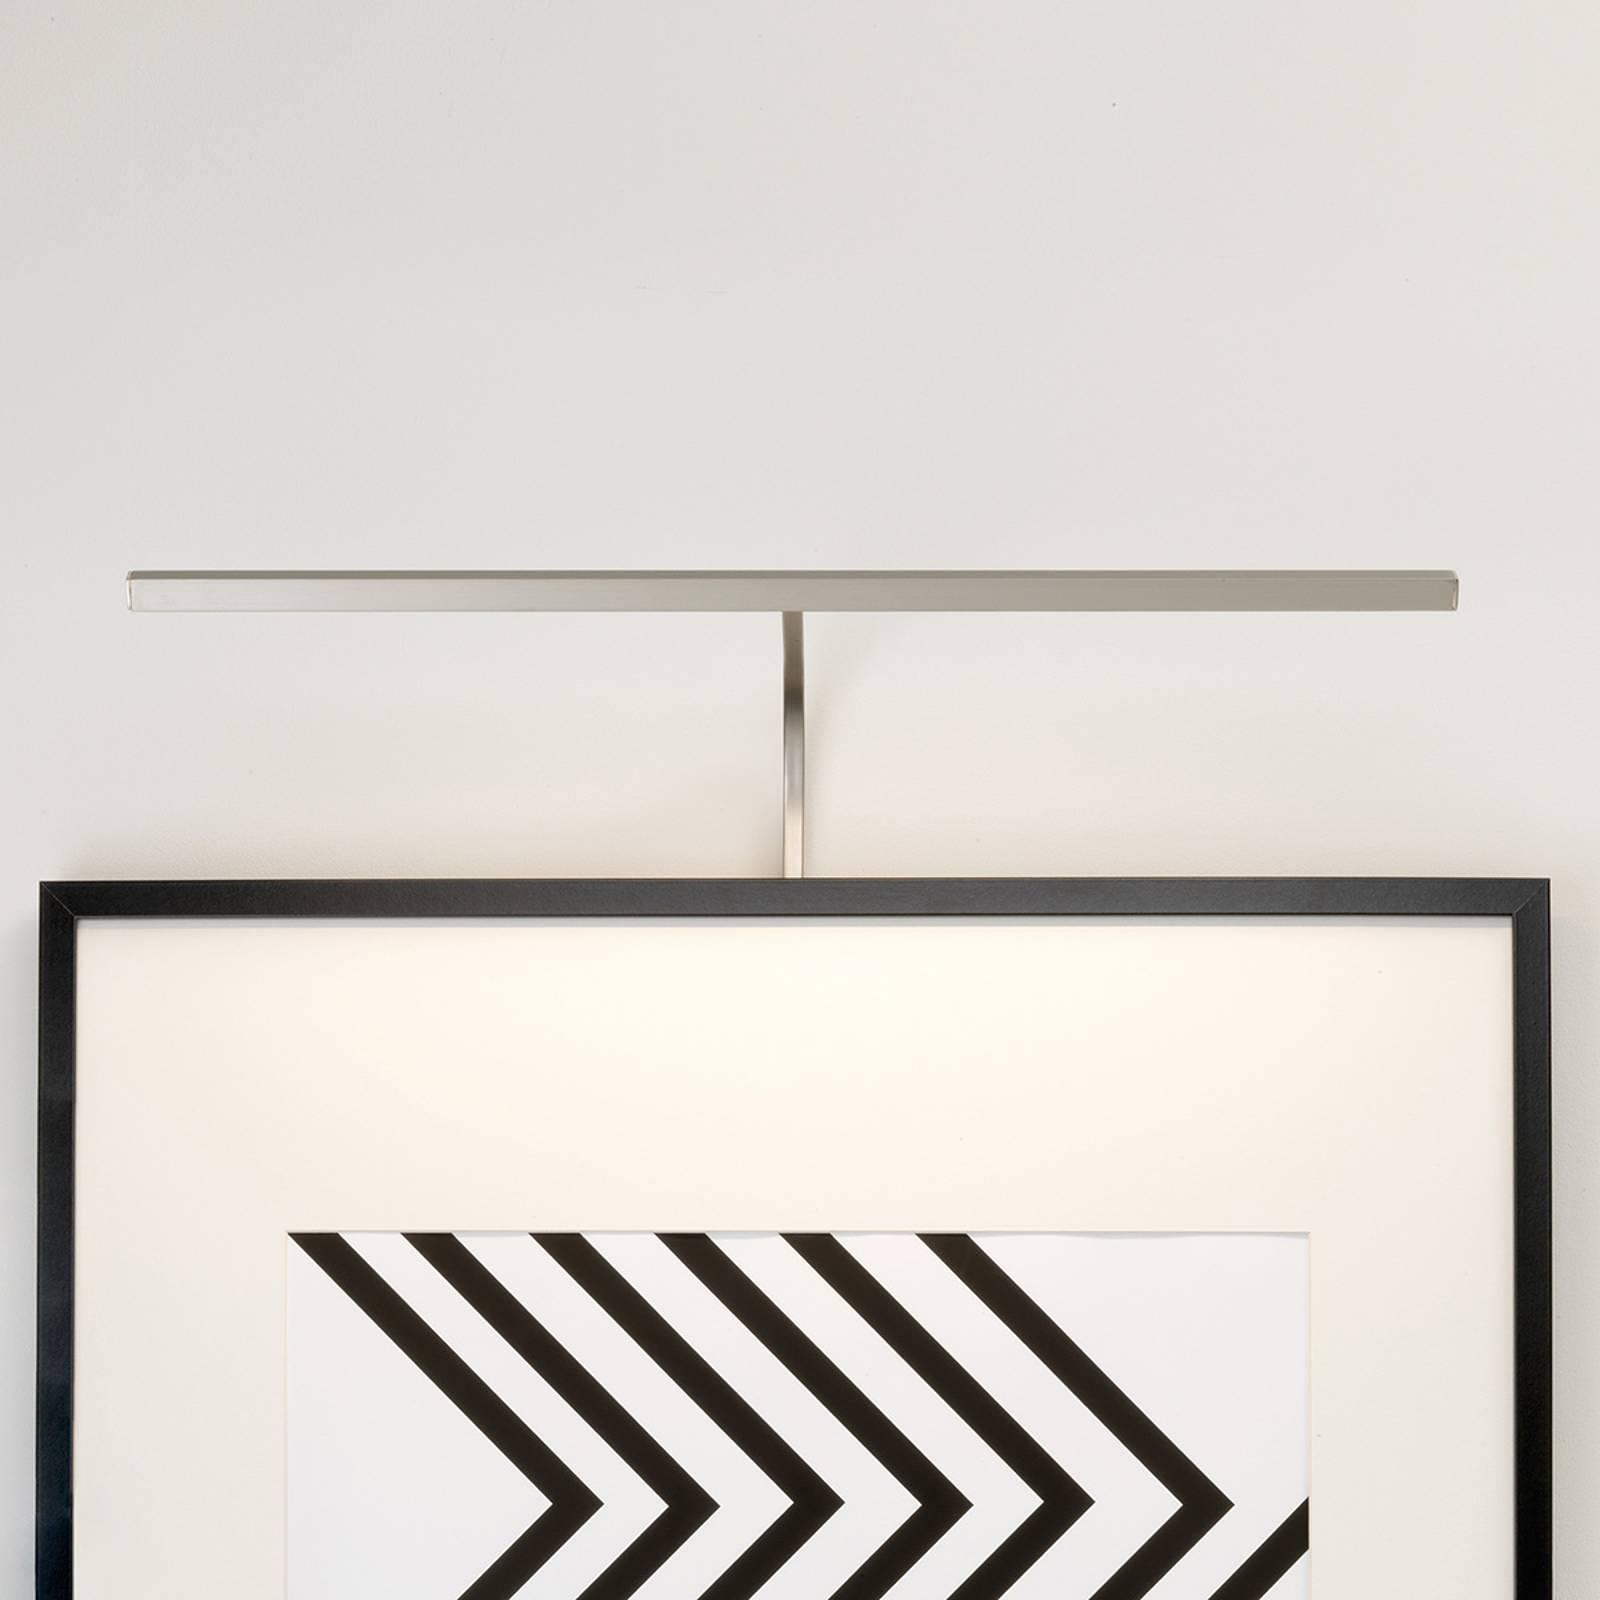 Astro Mondrian Frame Mounted -seinälamppu, 60 cm